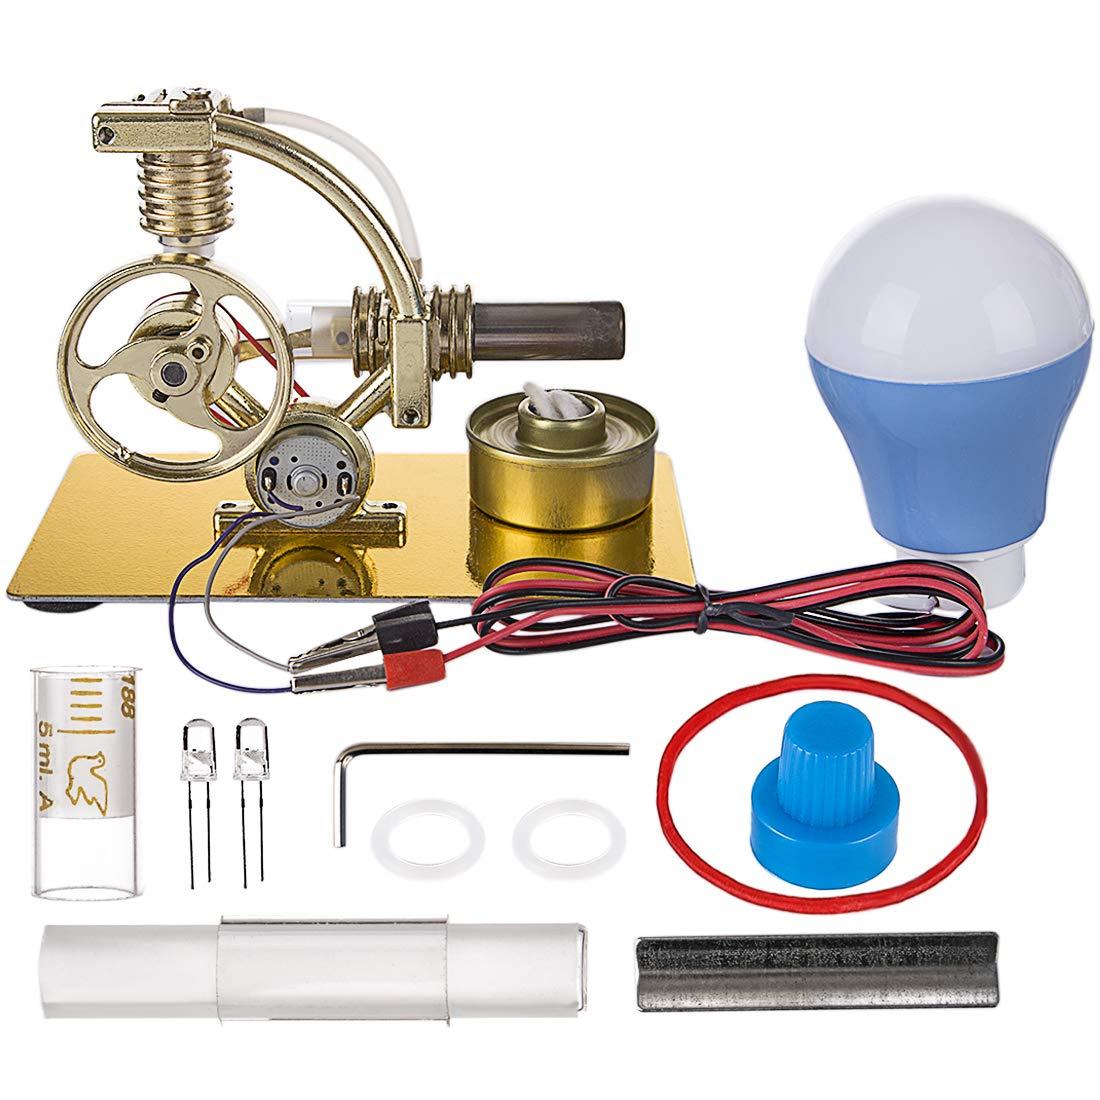 Yamix Stirling Engine Kit, L-Shape Single Cylinder Hot Air Stirling Engine Model with All-Metal Base and Big Bulb (Bulb Color Random)